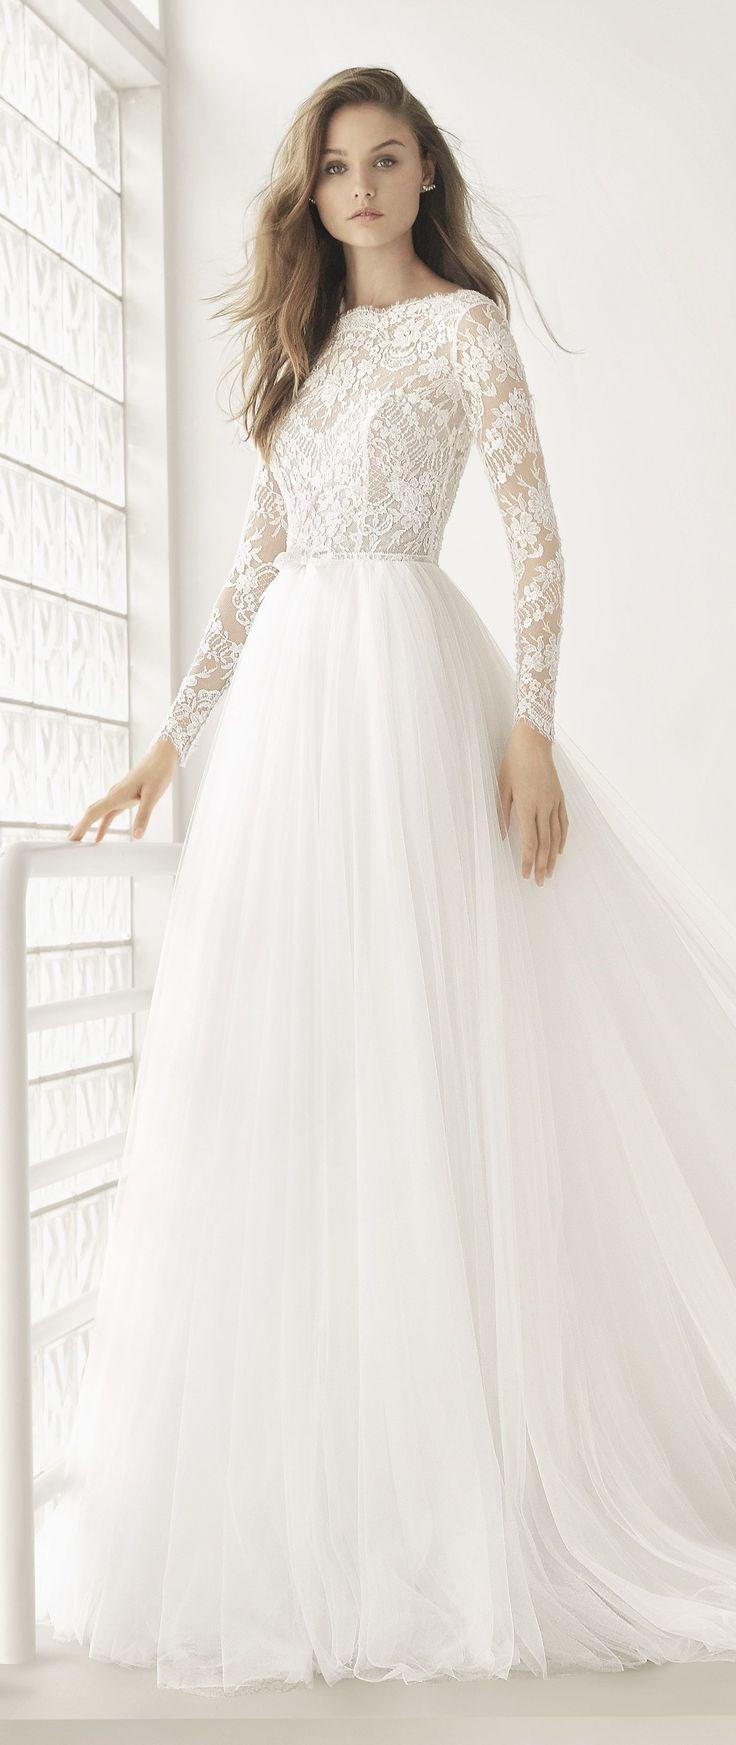 POEMA – 2018 Bridal Collection. Rosa Clará Couture Collection